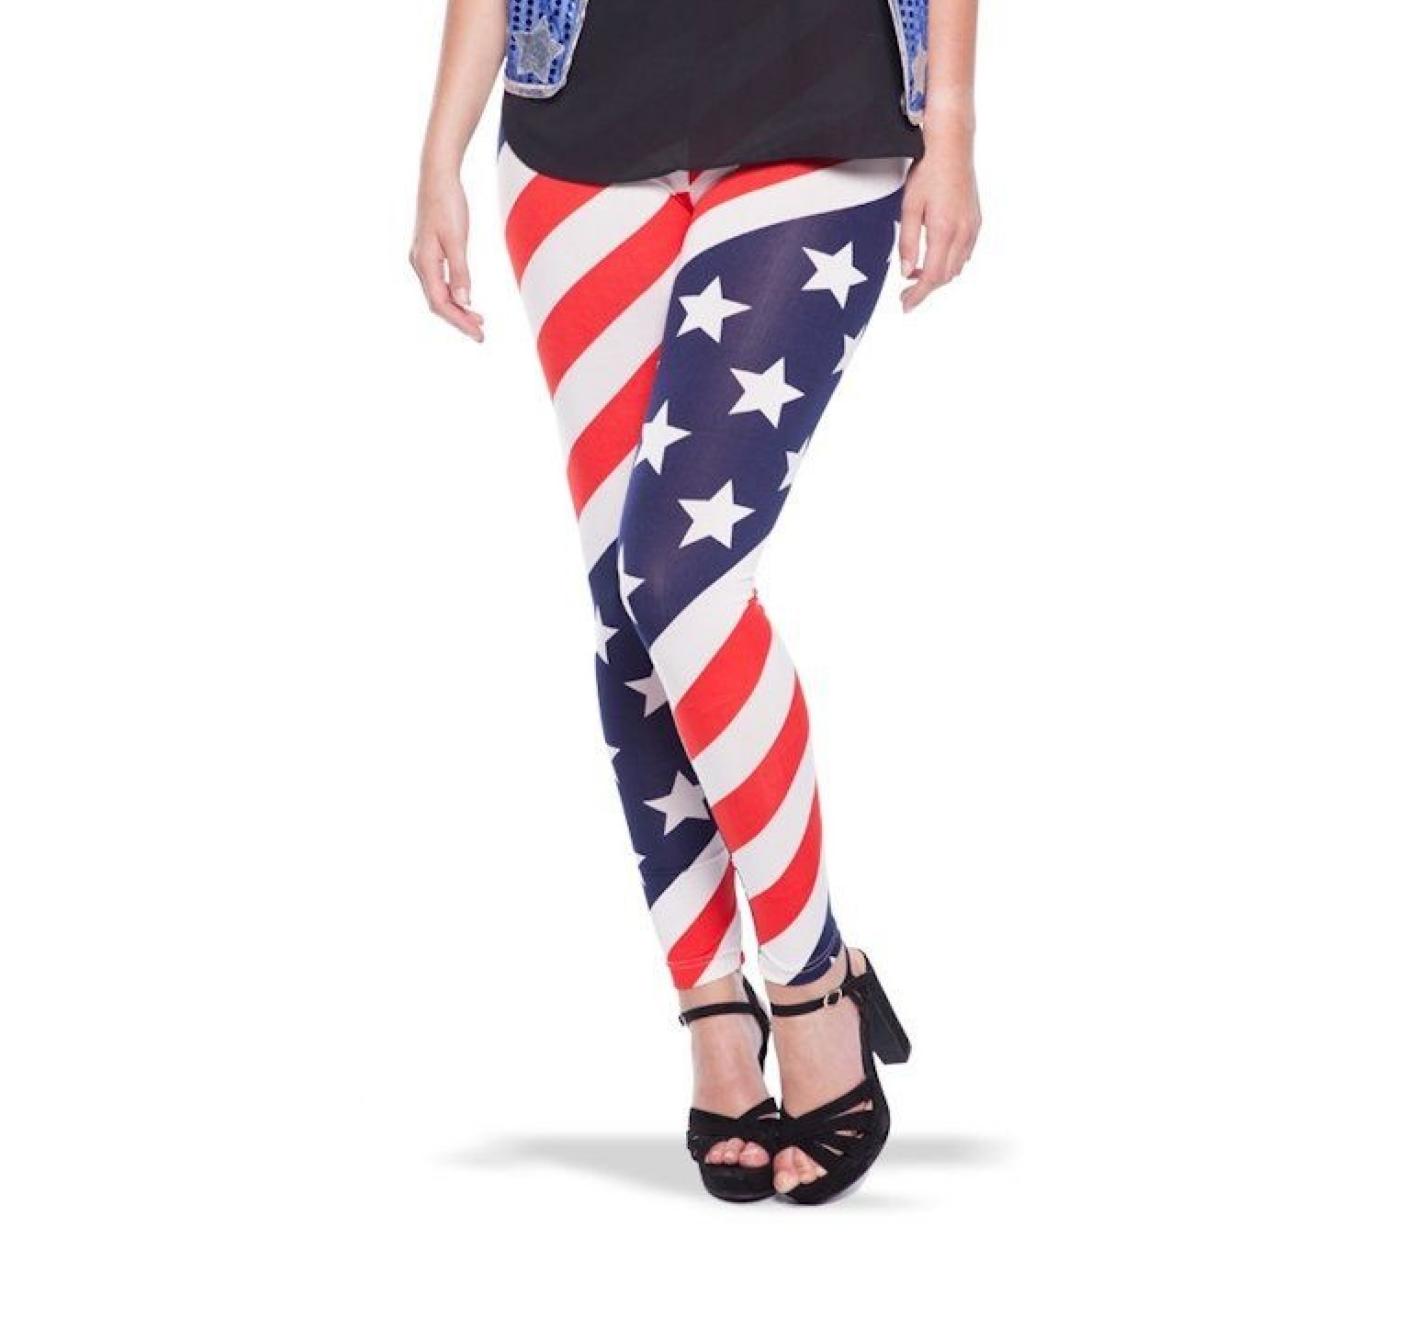 Panty's & leggings